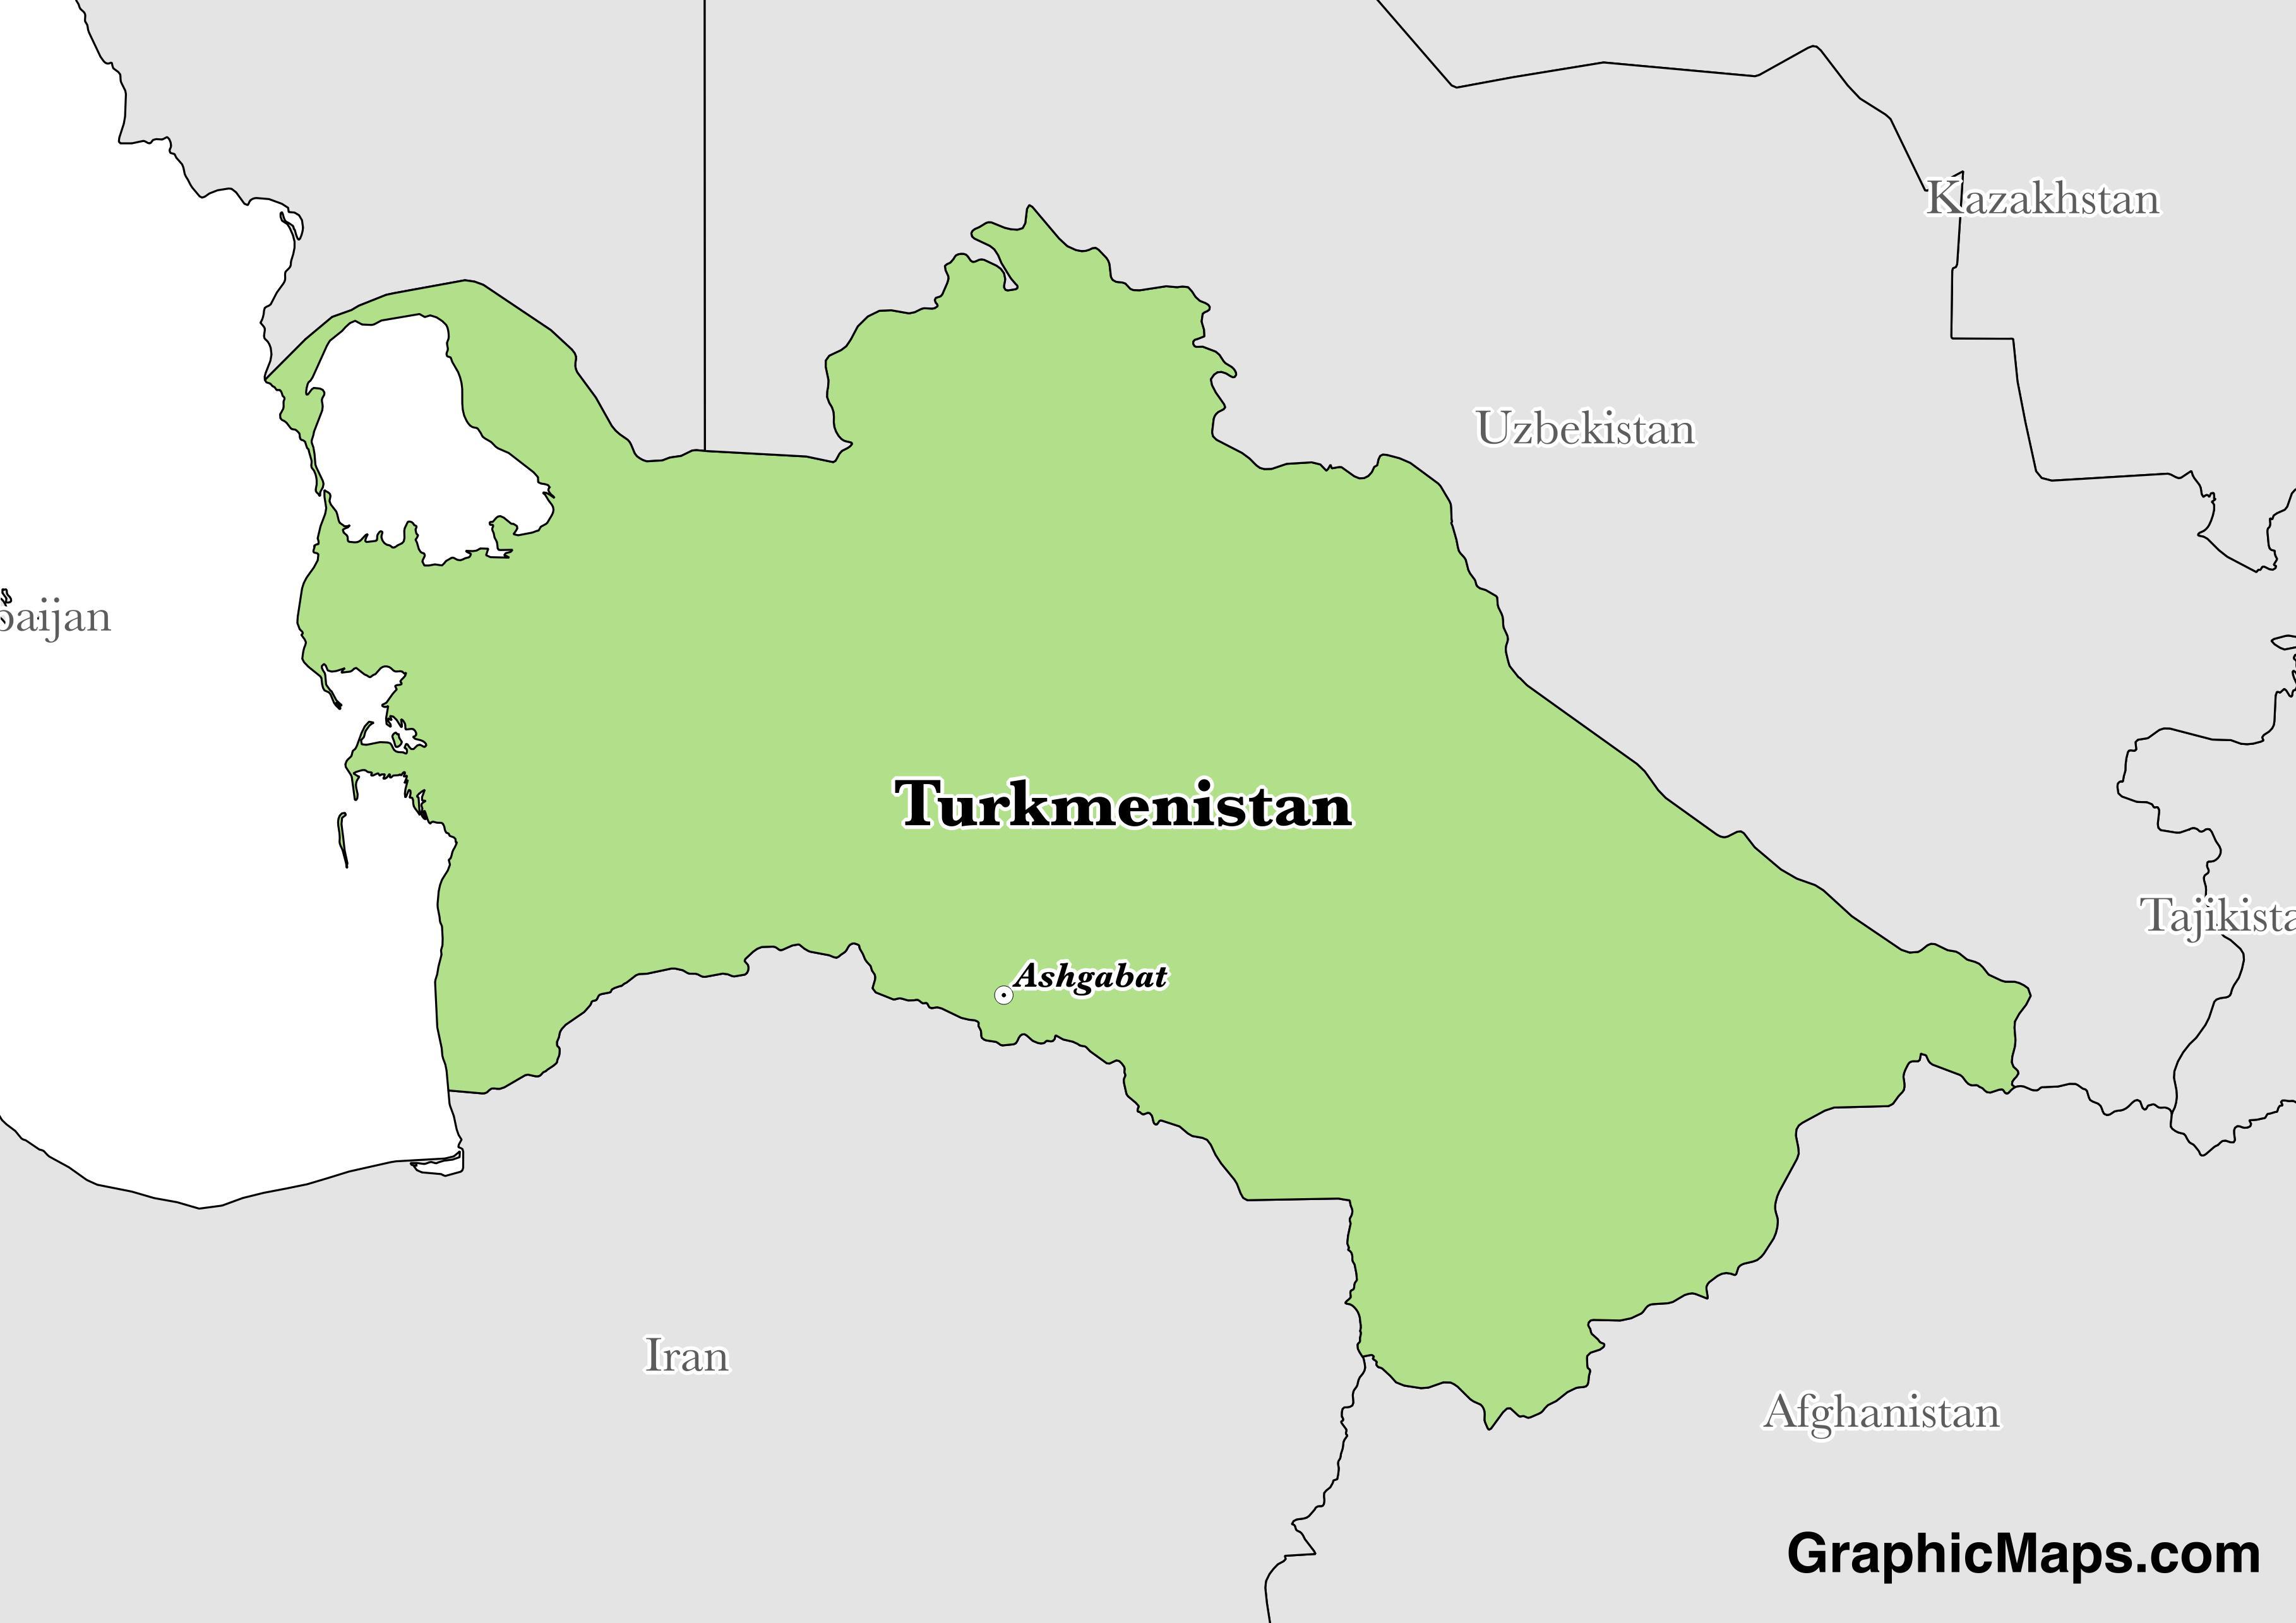 Turkmenistan GraphicMapscom - Turkmenistan map